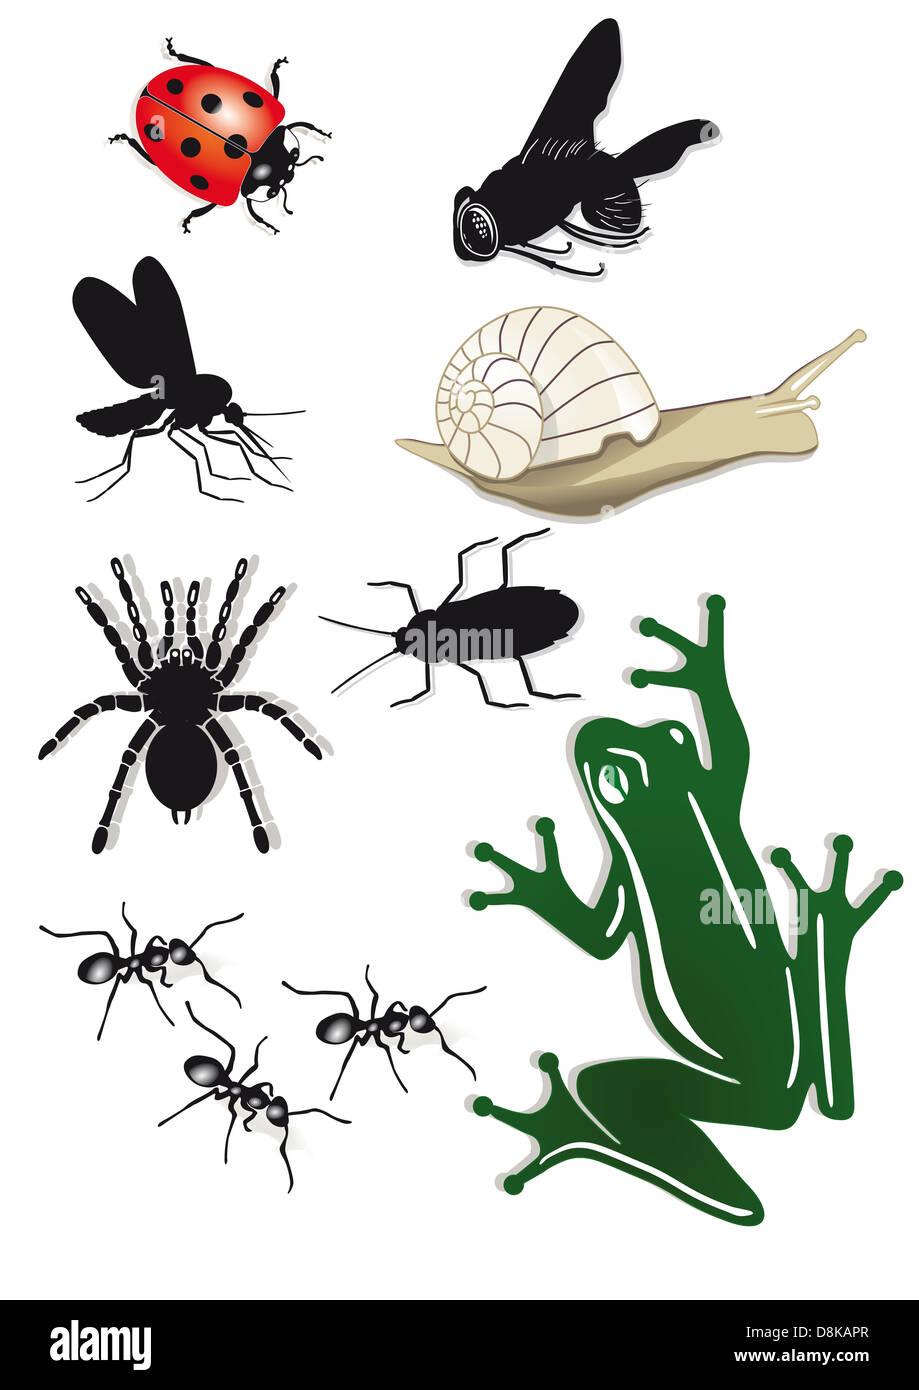 Creepy Crawlies - Stock Image